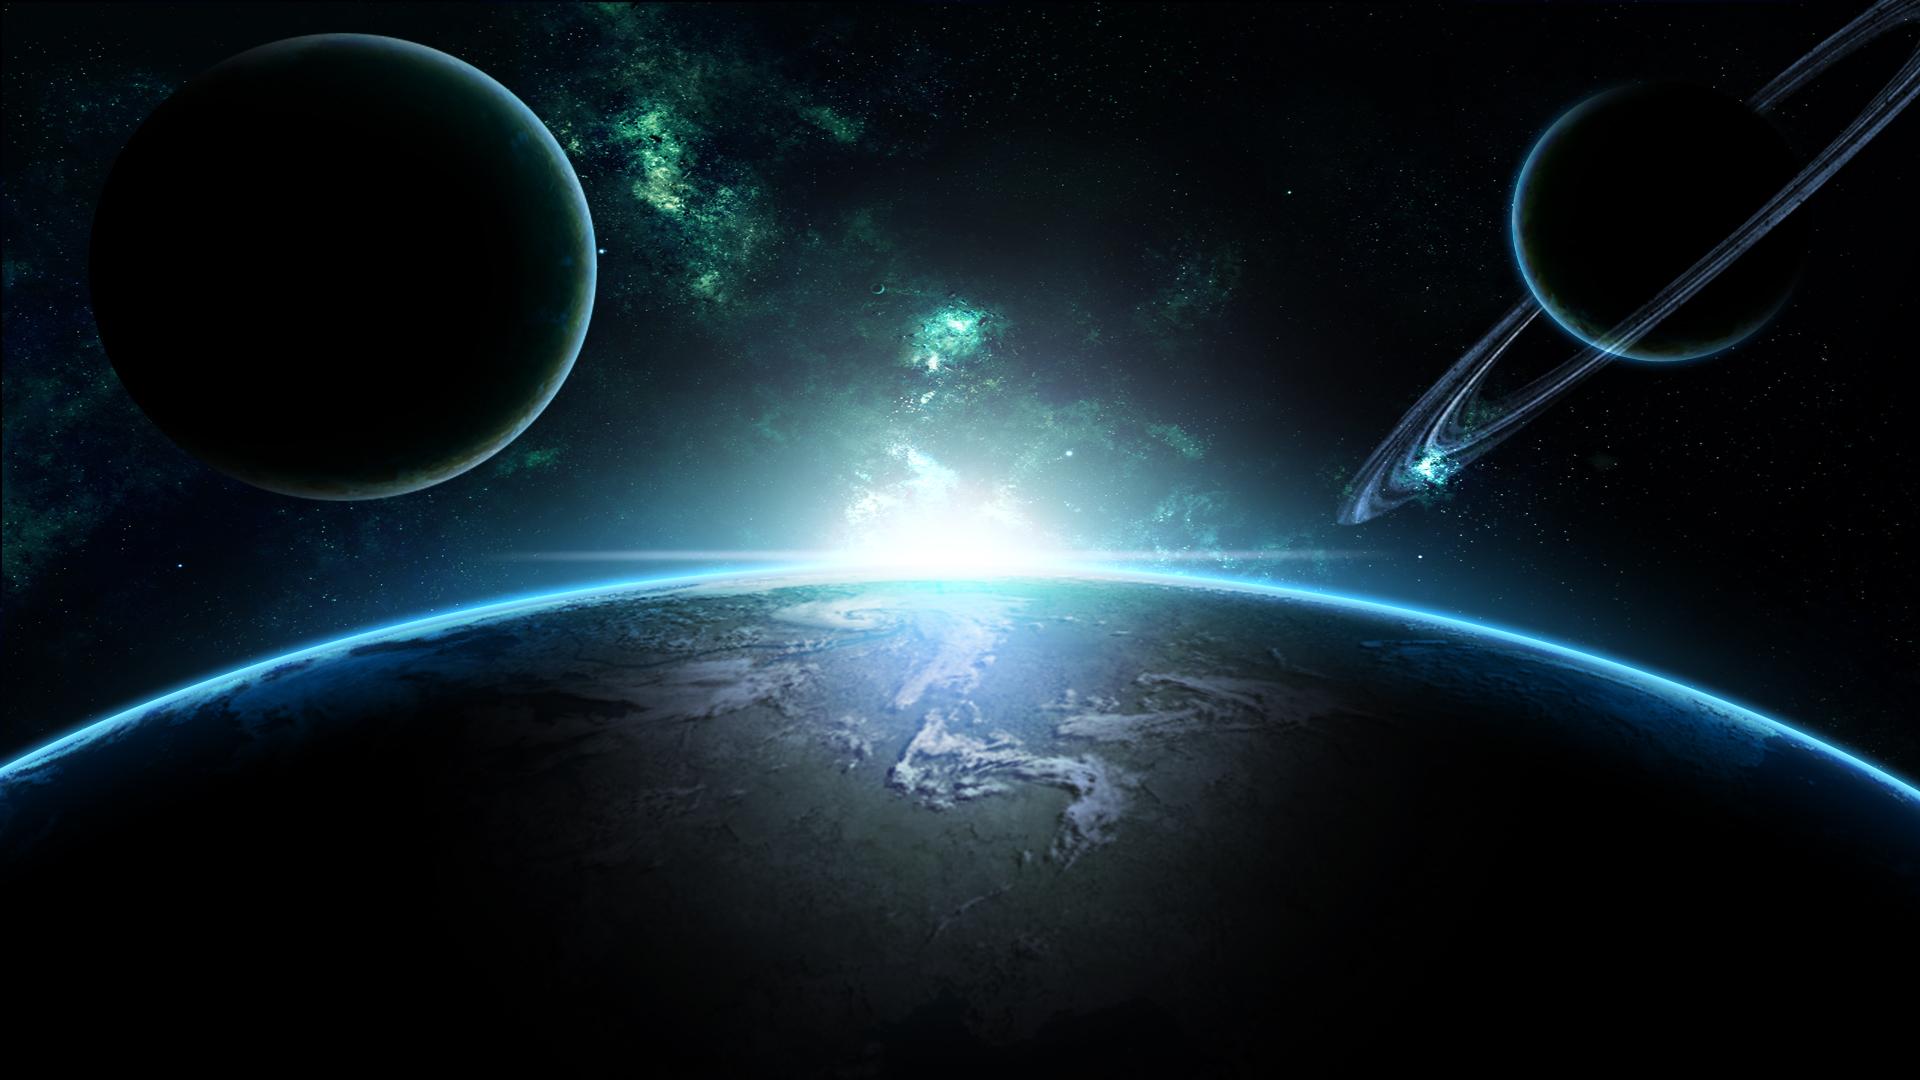 FunMozar Planet Earth Wallpapers 1920x1080